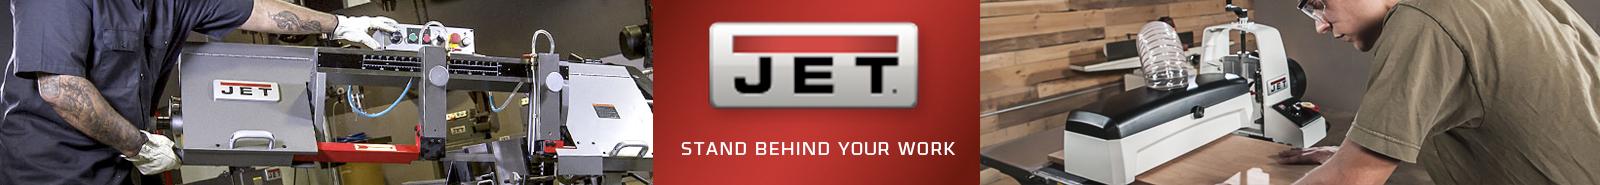 jet-tools.jpg